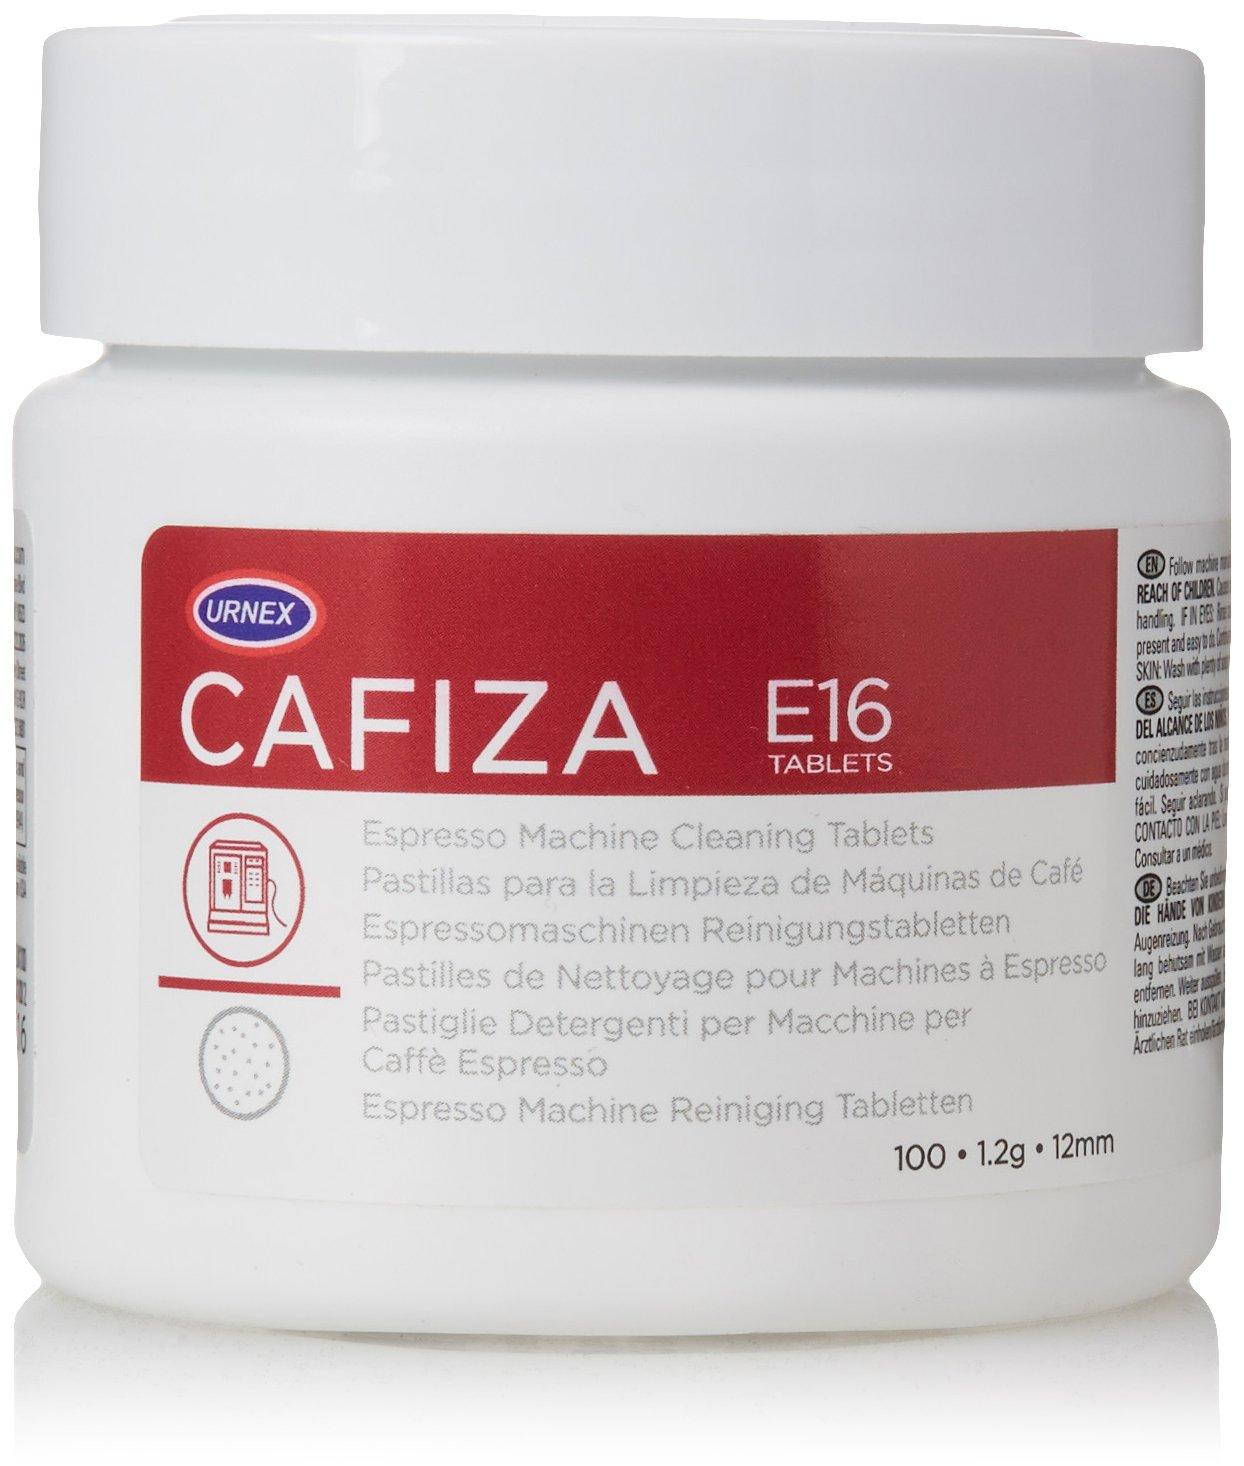 Amazon.com: Urnex Cafiza Espresso Machine Cleaning Tablets, 100 Count: Prime Pantry